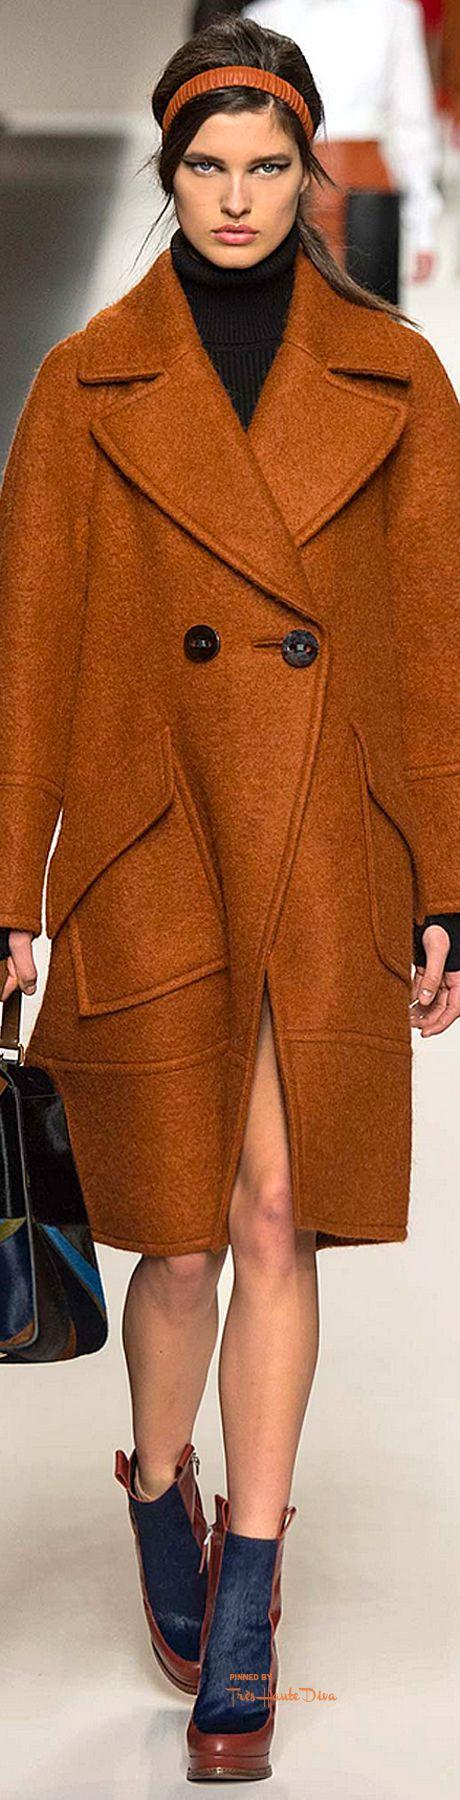 Farb-und Stilberatung mit www.farben-reich.com - #MFW Fendi Fall 2015 RTW Designer: Karl Lagerfeld ♔THD♔